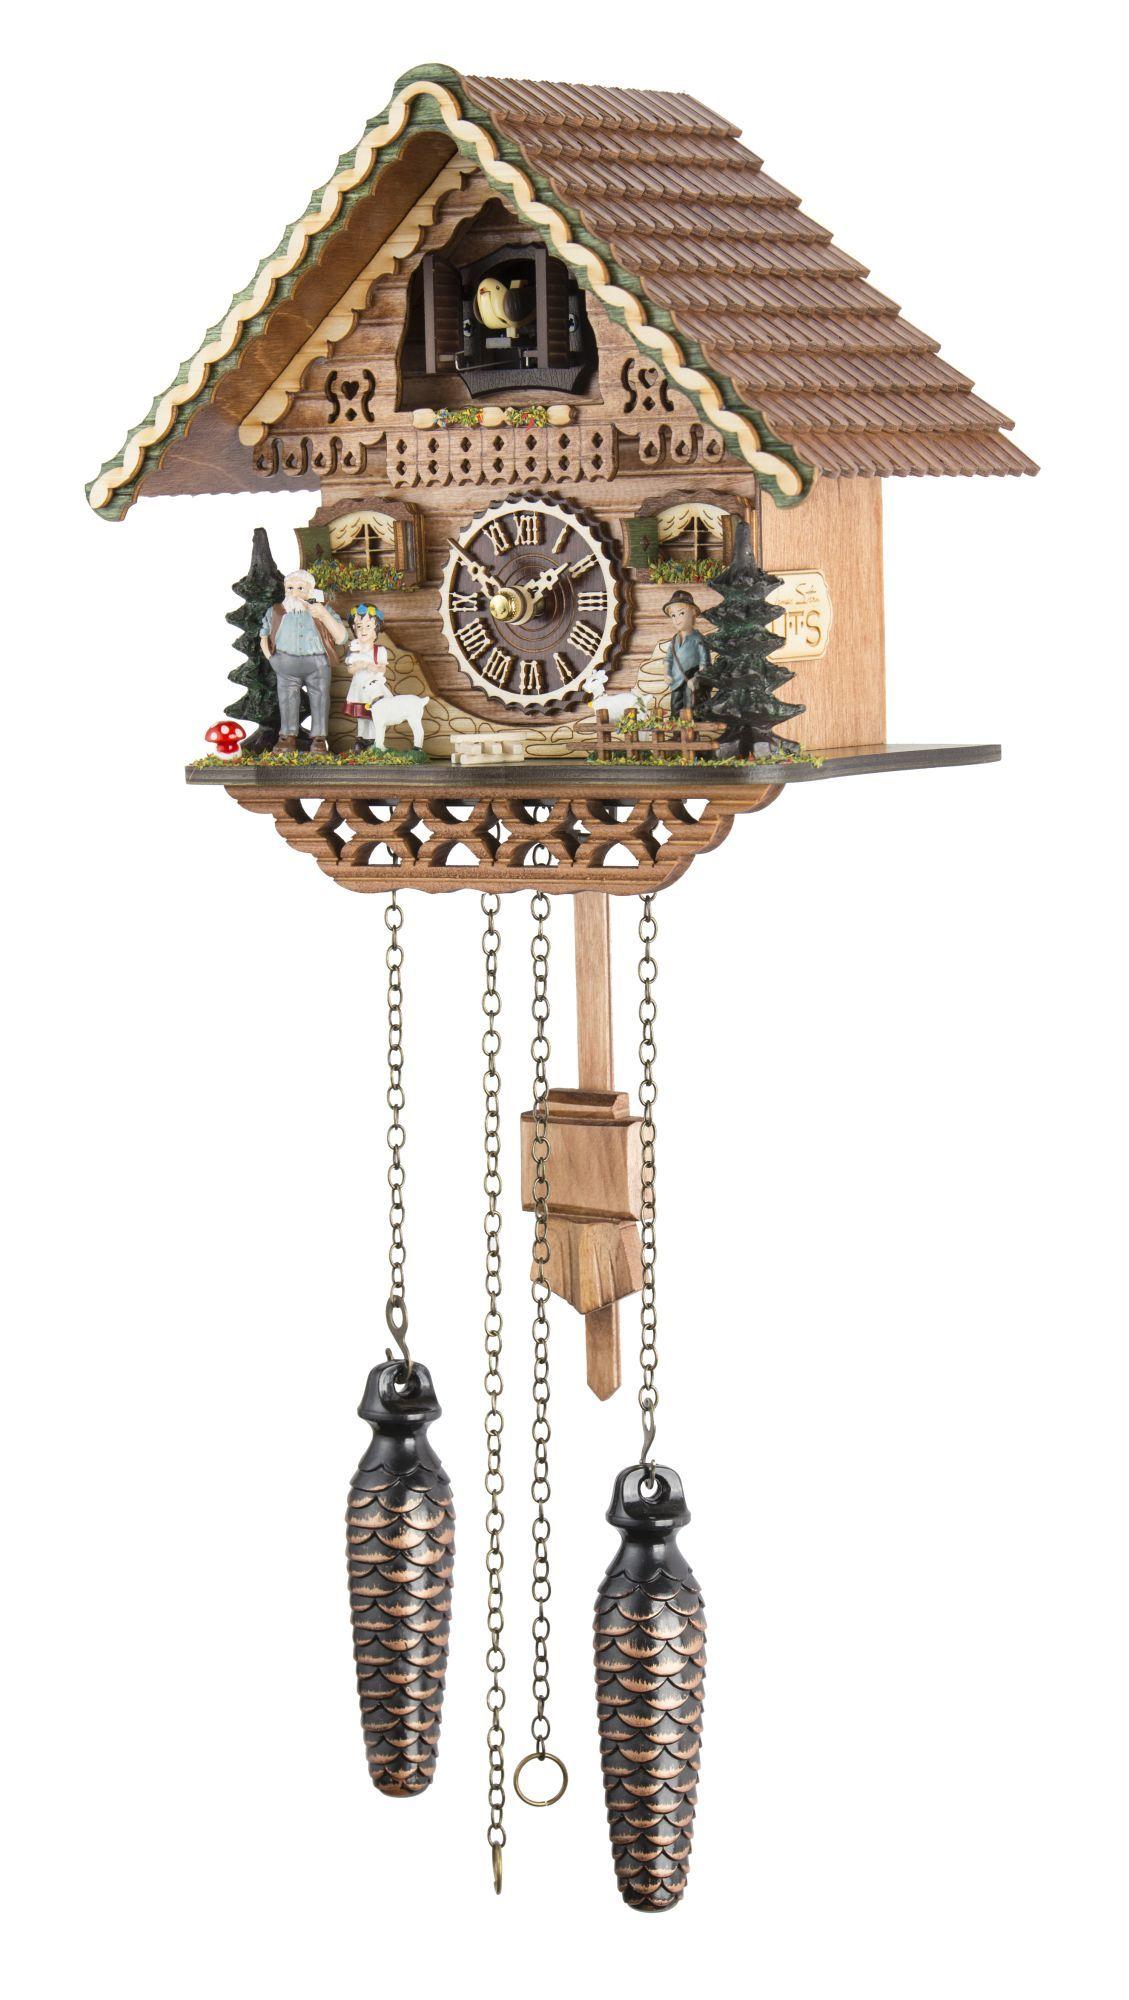 Часы настенные Часы настенные с кукушкой Tomas Stern 5029 chasy-nastennye-s-kukushkoy-tomas-stern-5029-germaniya.jpg